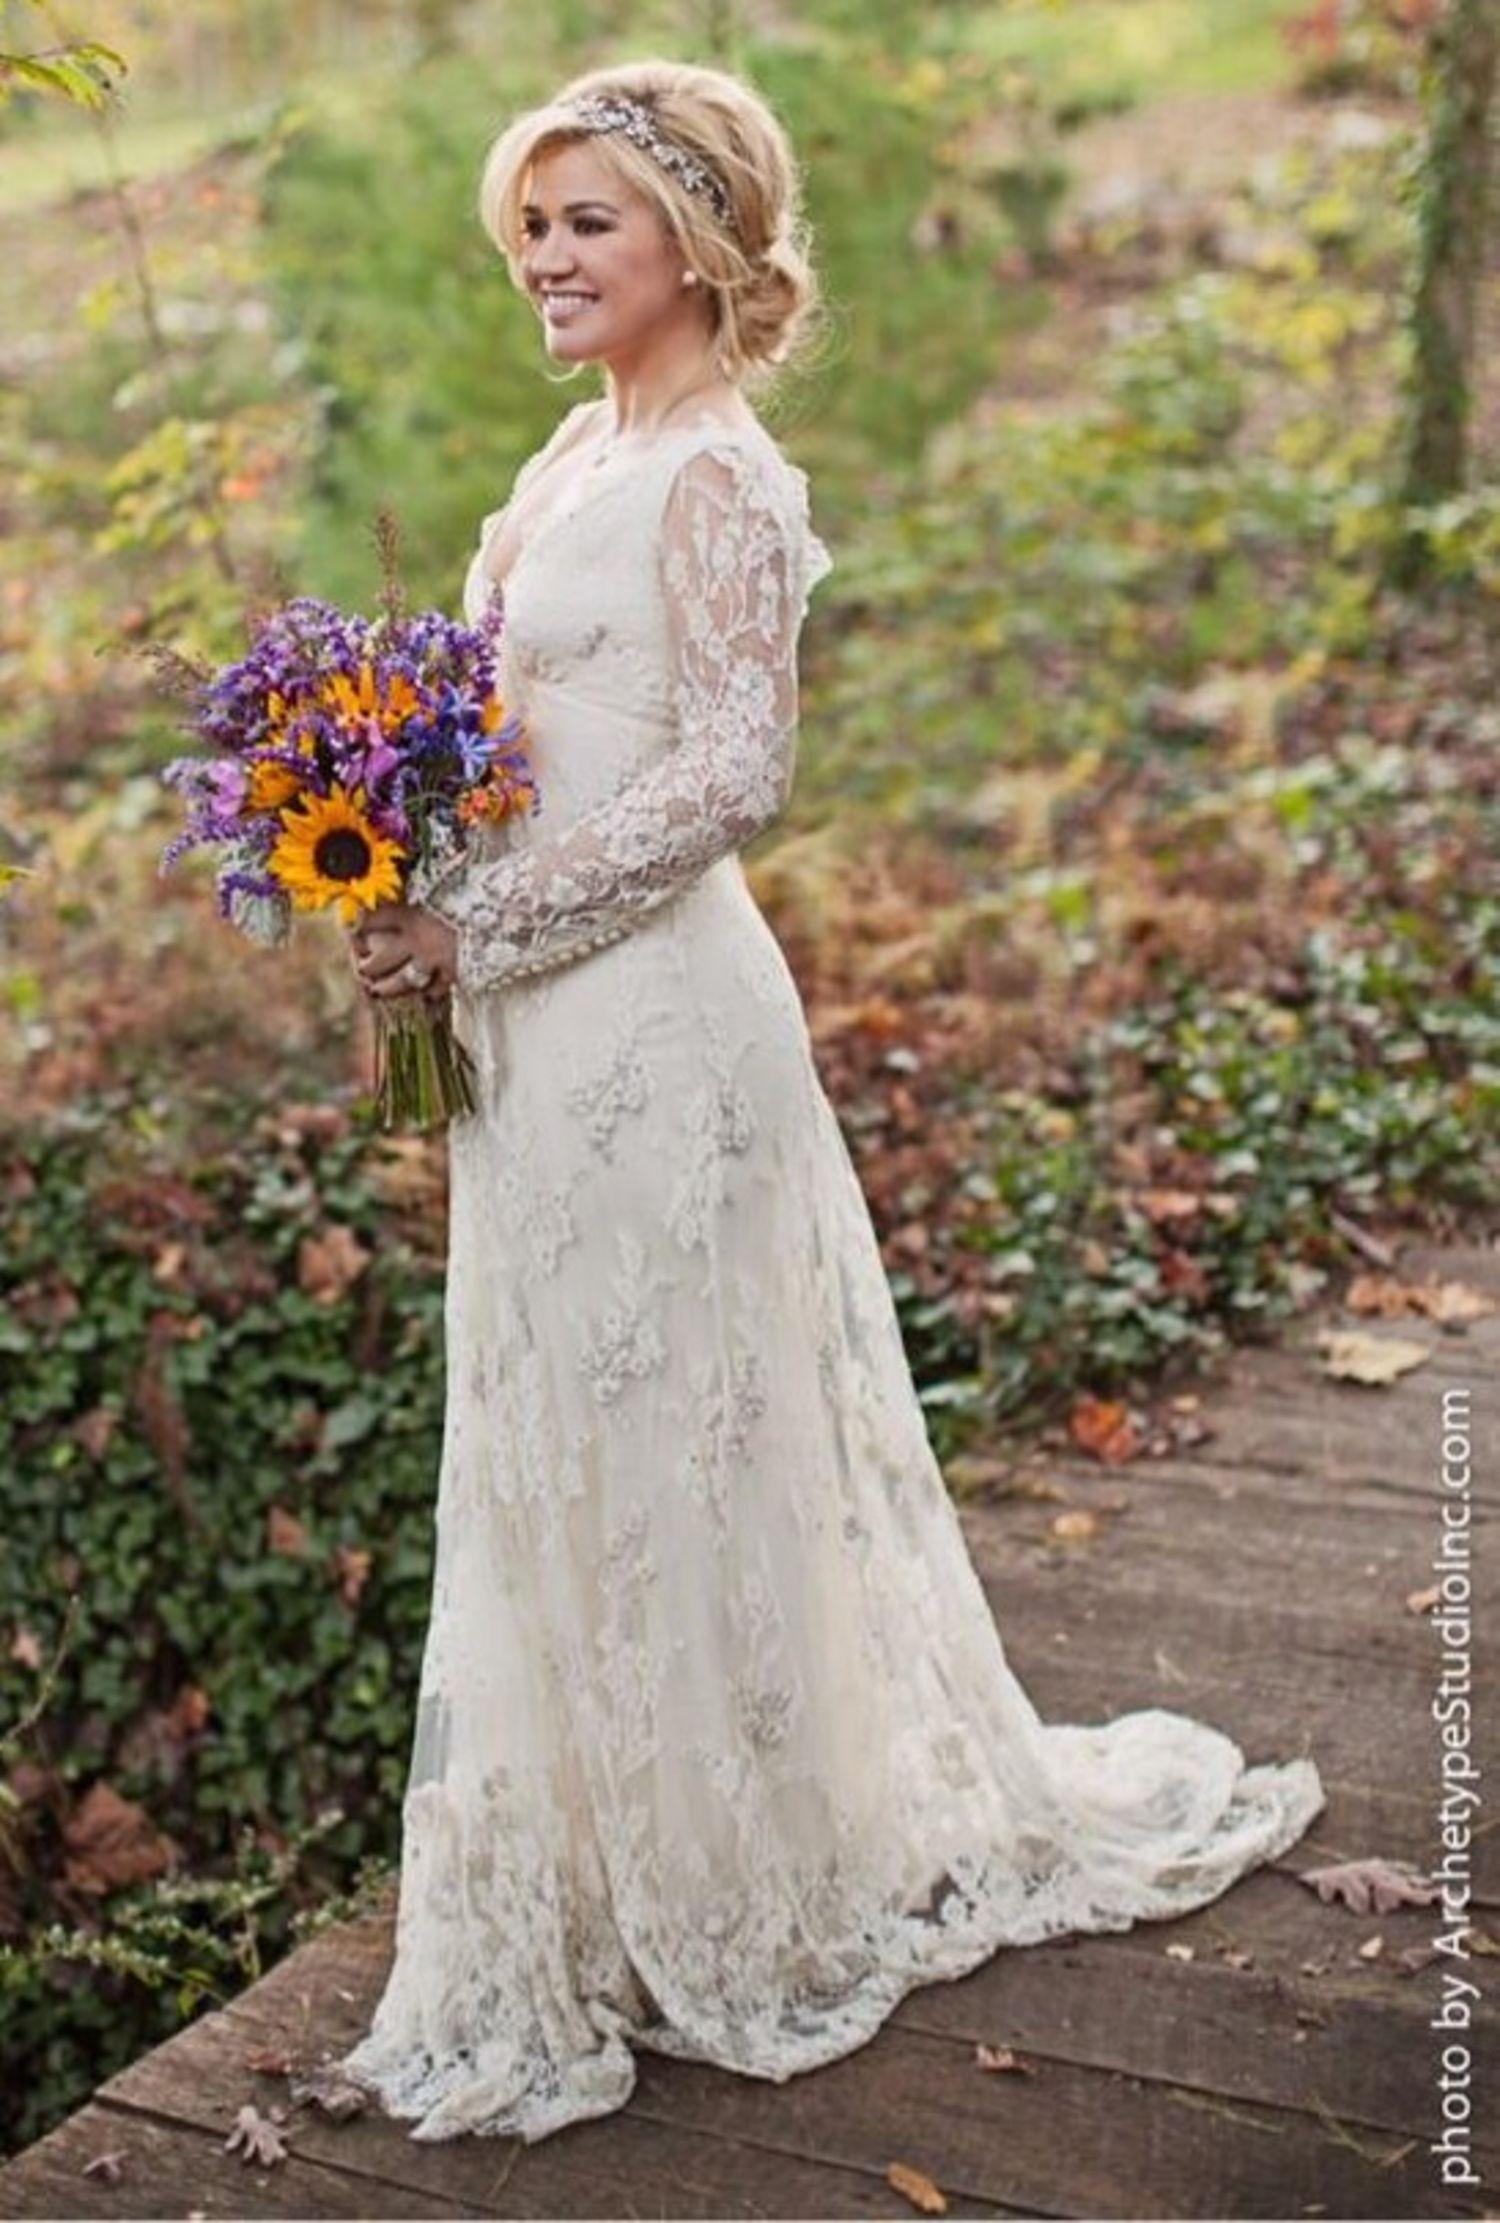 Kelly Clarkson Wedding: Kimberly Perry Wedding Dress At Reisefeber.org